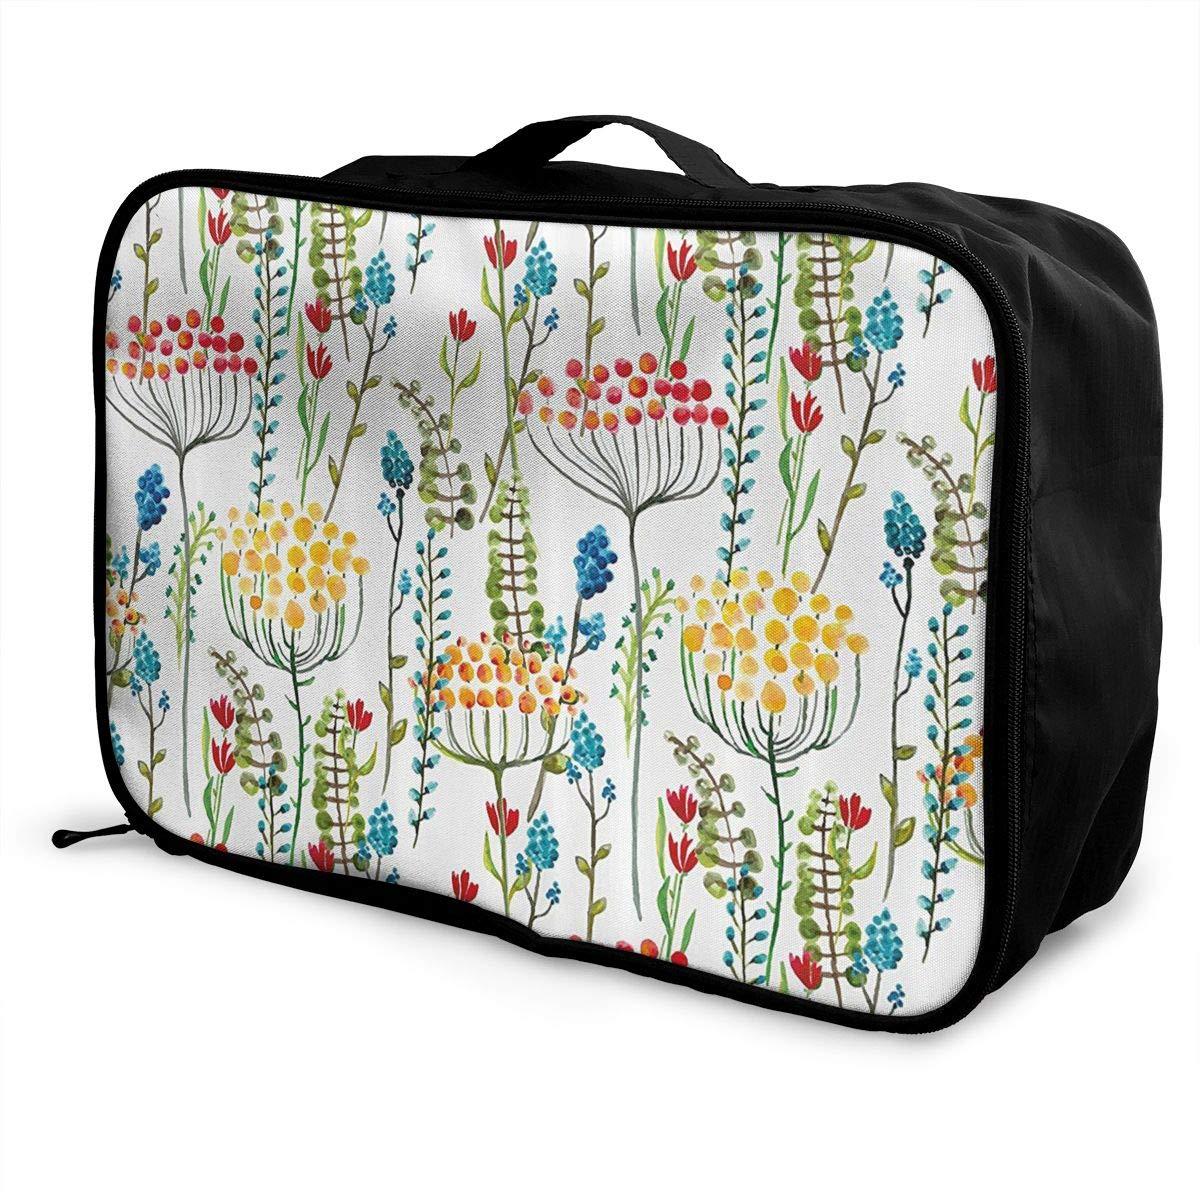 ADGAI Hand Drawn Doodle Style Canvas Travel Weekender Bag,Fashion Custom Lightweight Large Capacity Portable Luggage Bag,Suitcase Trolley Bag